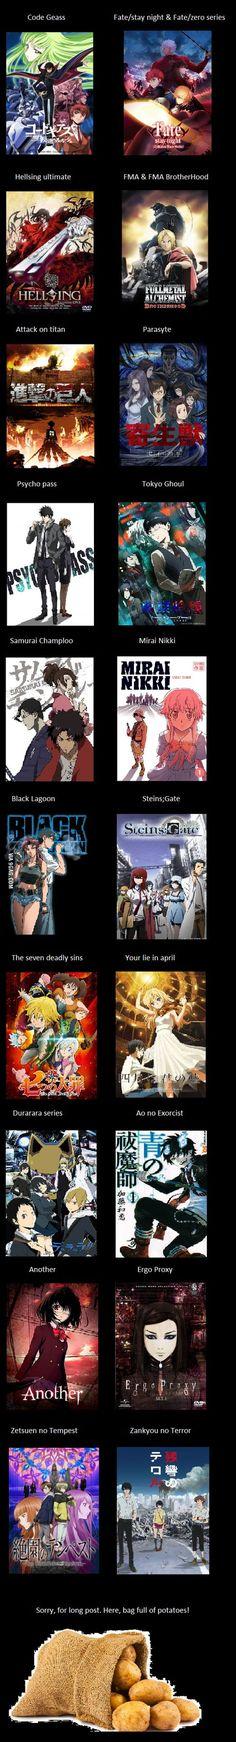 Good Anime To Watch, Anime Watch, I Love Anime, Awesome Anime, Manga Anime, Otaku Anime, Fille Anime Cool, Desu Desu, 4 Panel Life